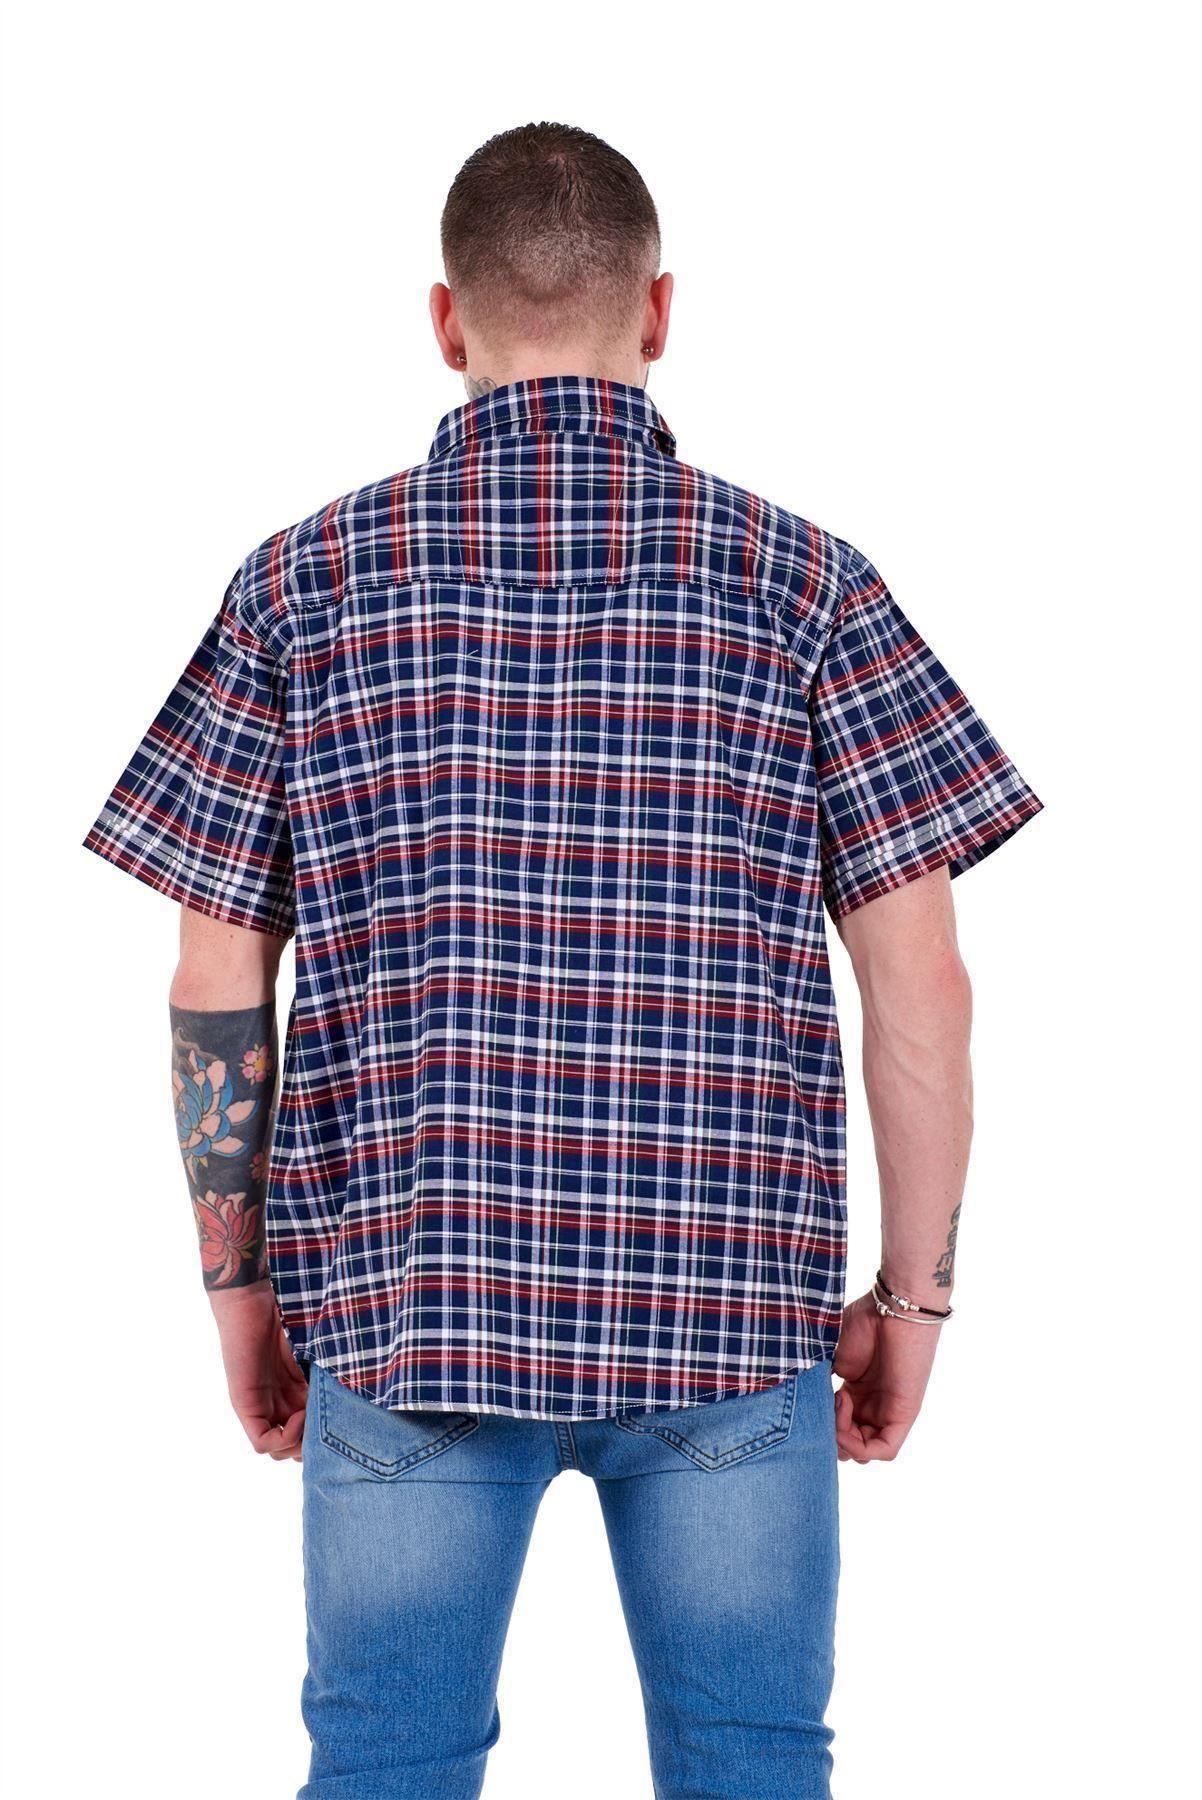 Mens-Regular-Big-Size-Shirts-Checked-Cotton-Blend-Casual-Short-Sleeve-M-to-5XL thumbnail 20